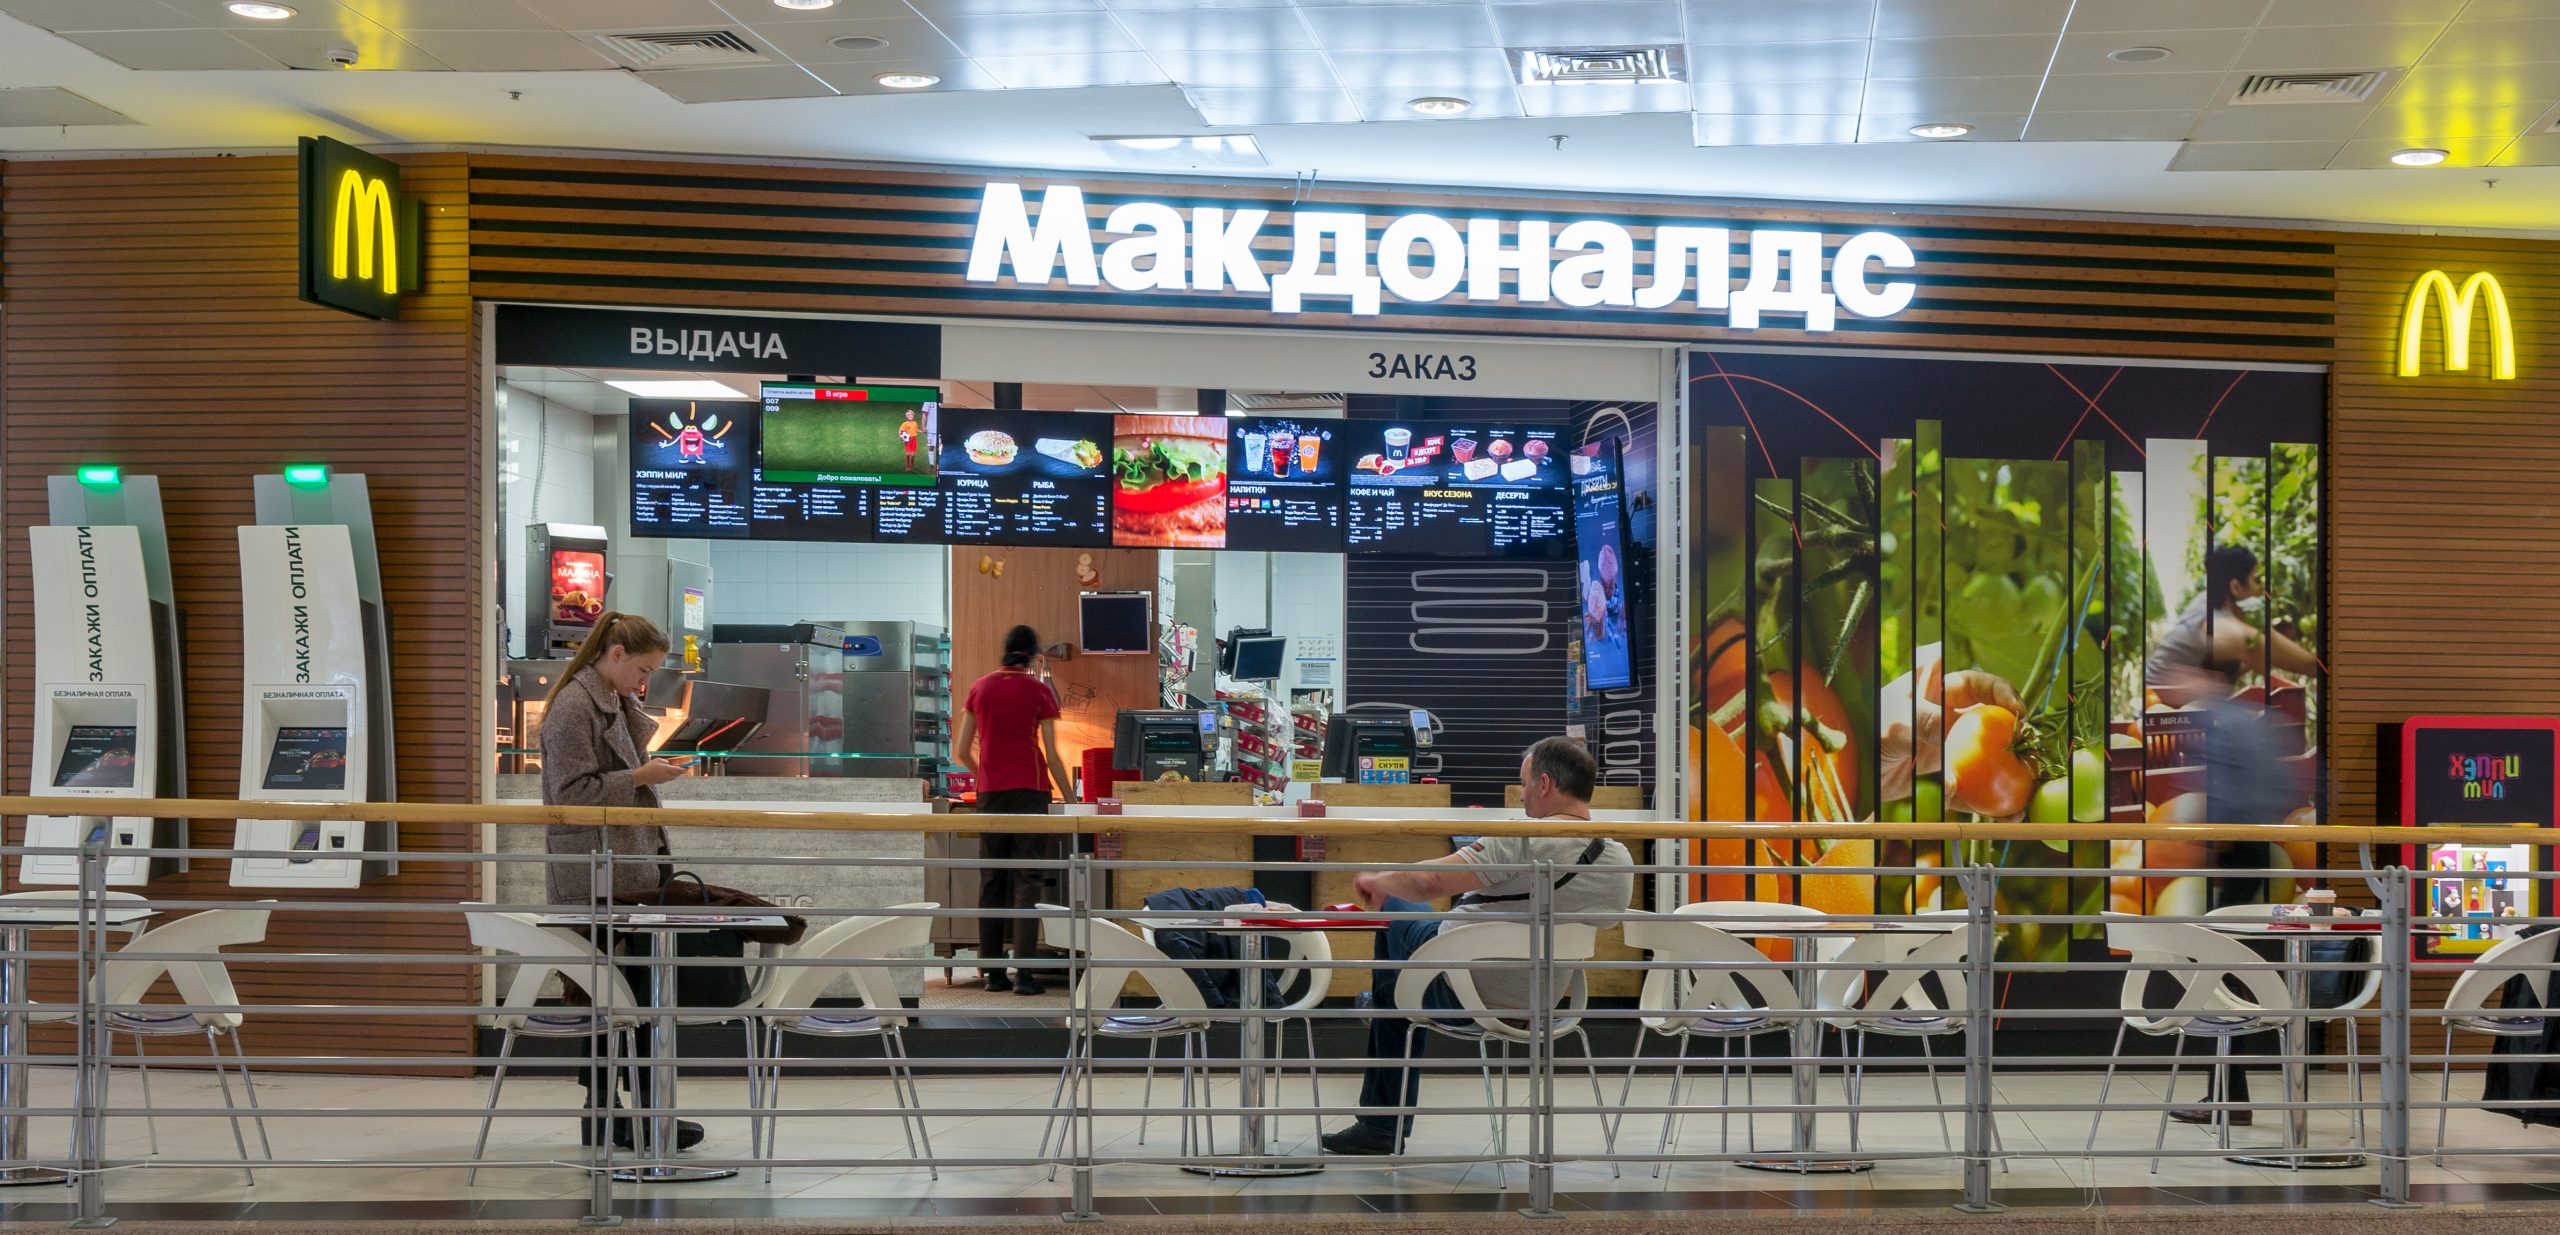 localization_mcdonalds_russia